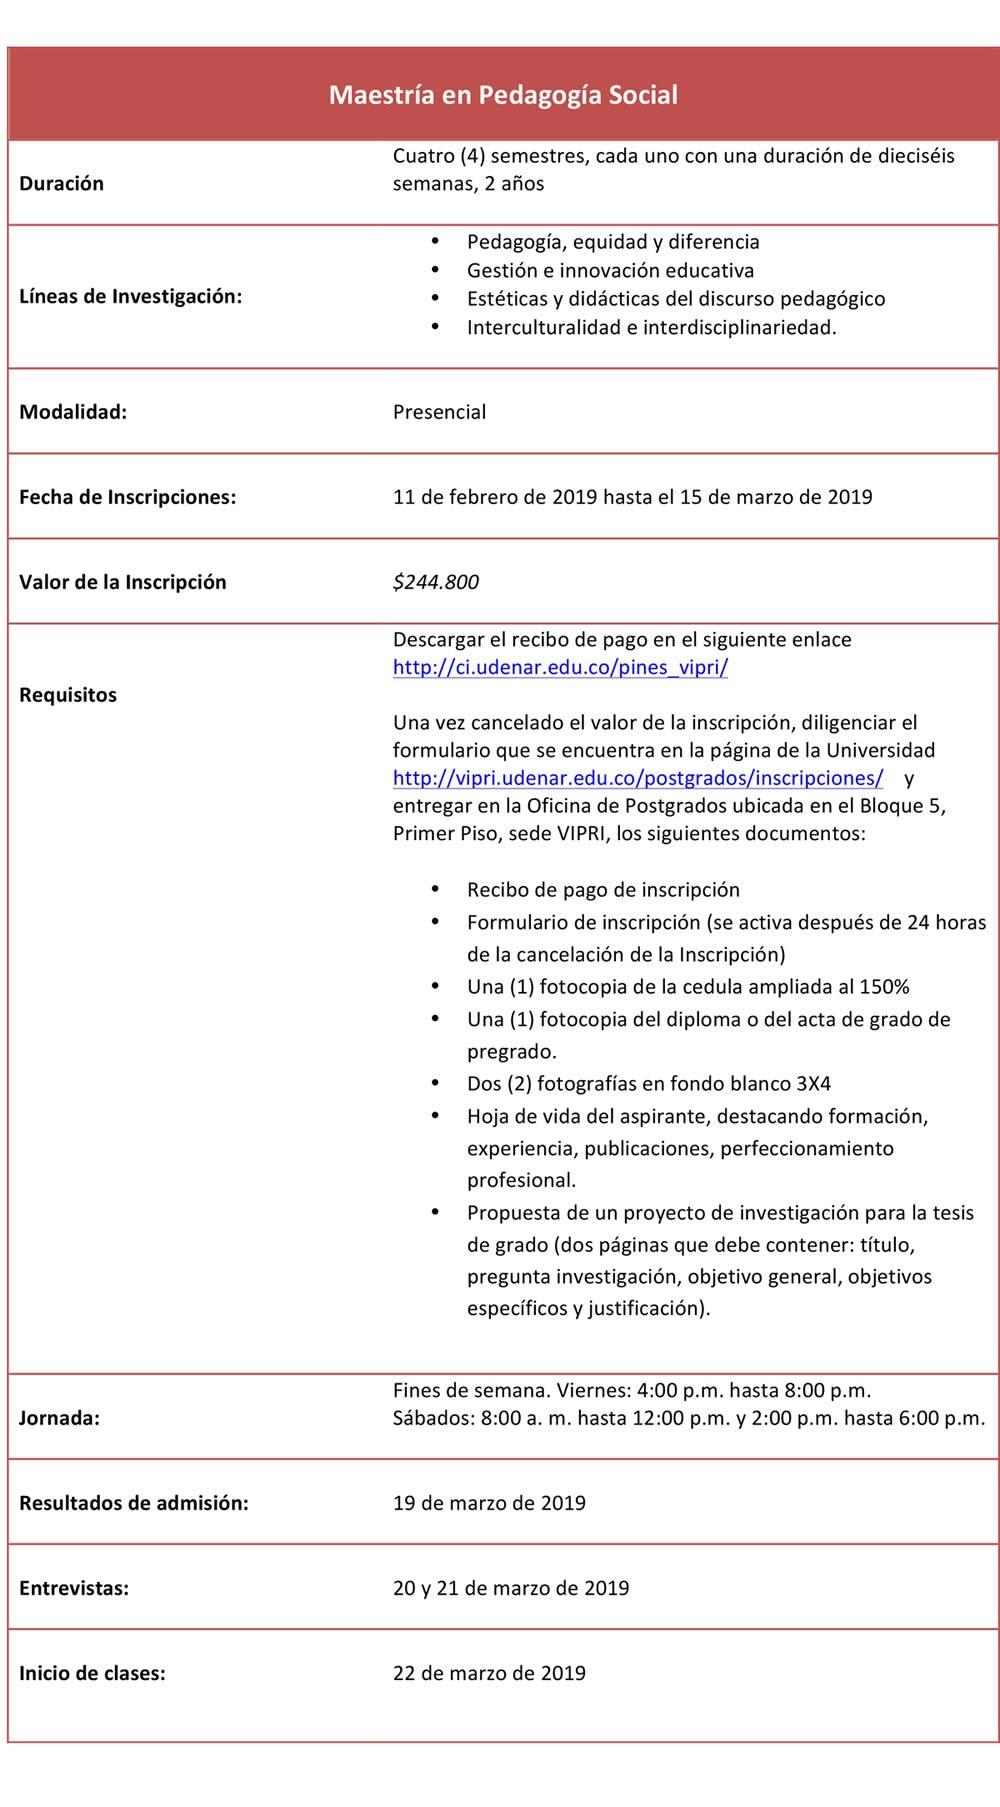 maestria-en-pedagogia-social-2